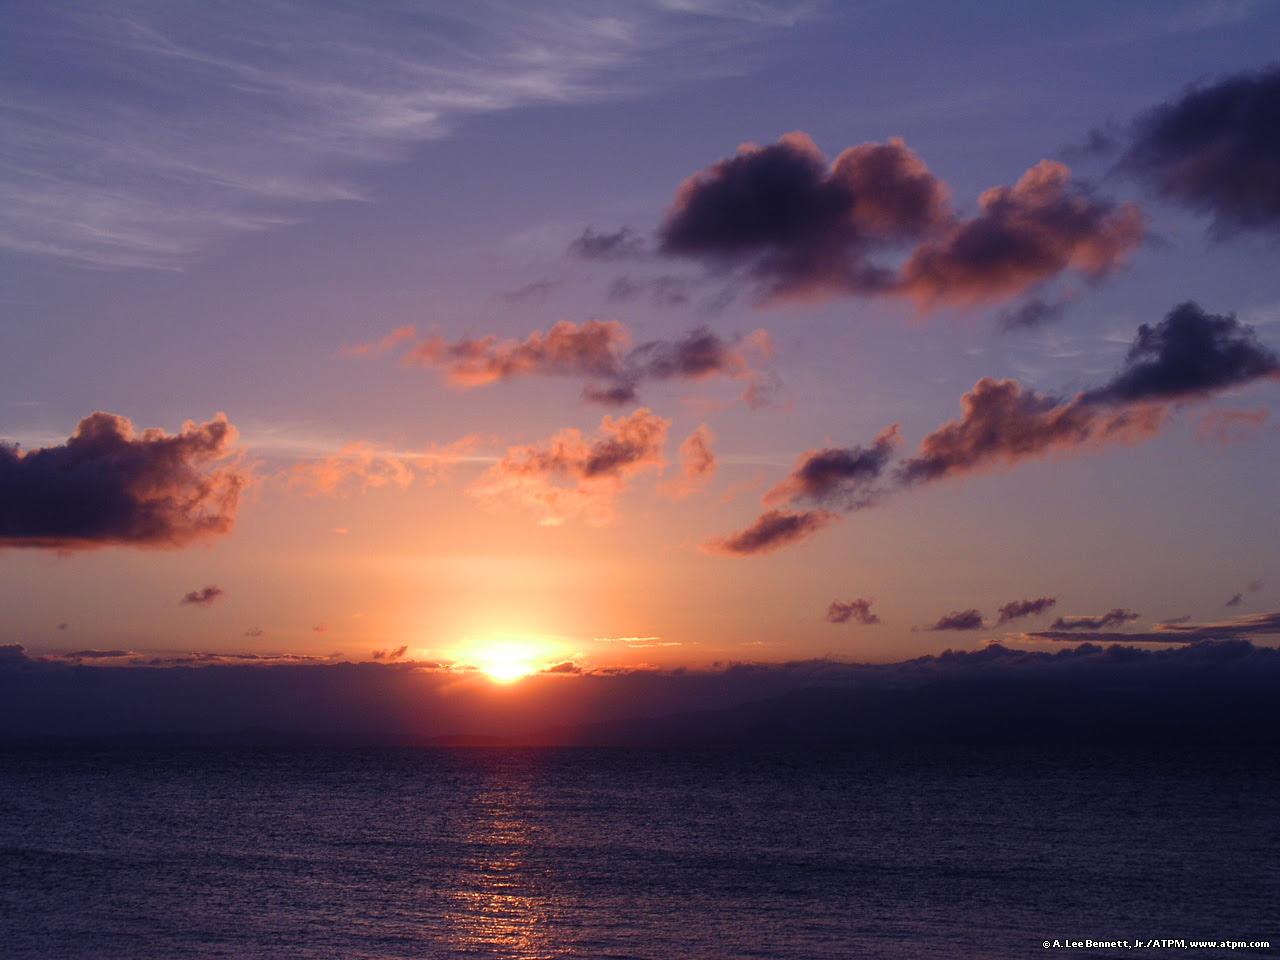 Sunset Over Puerto Rico Puerto Rico Wallpaper 331593 Fanpop